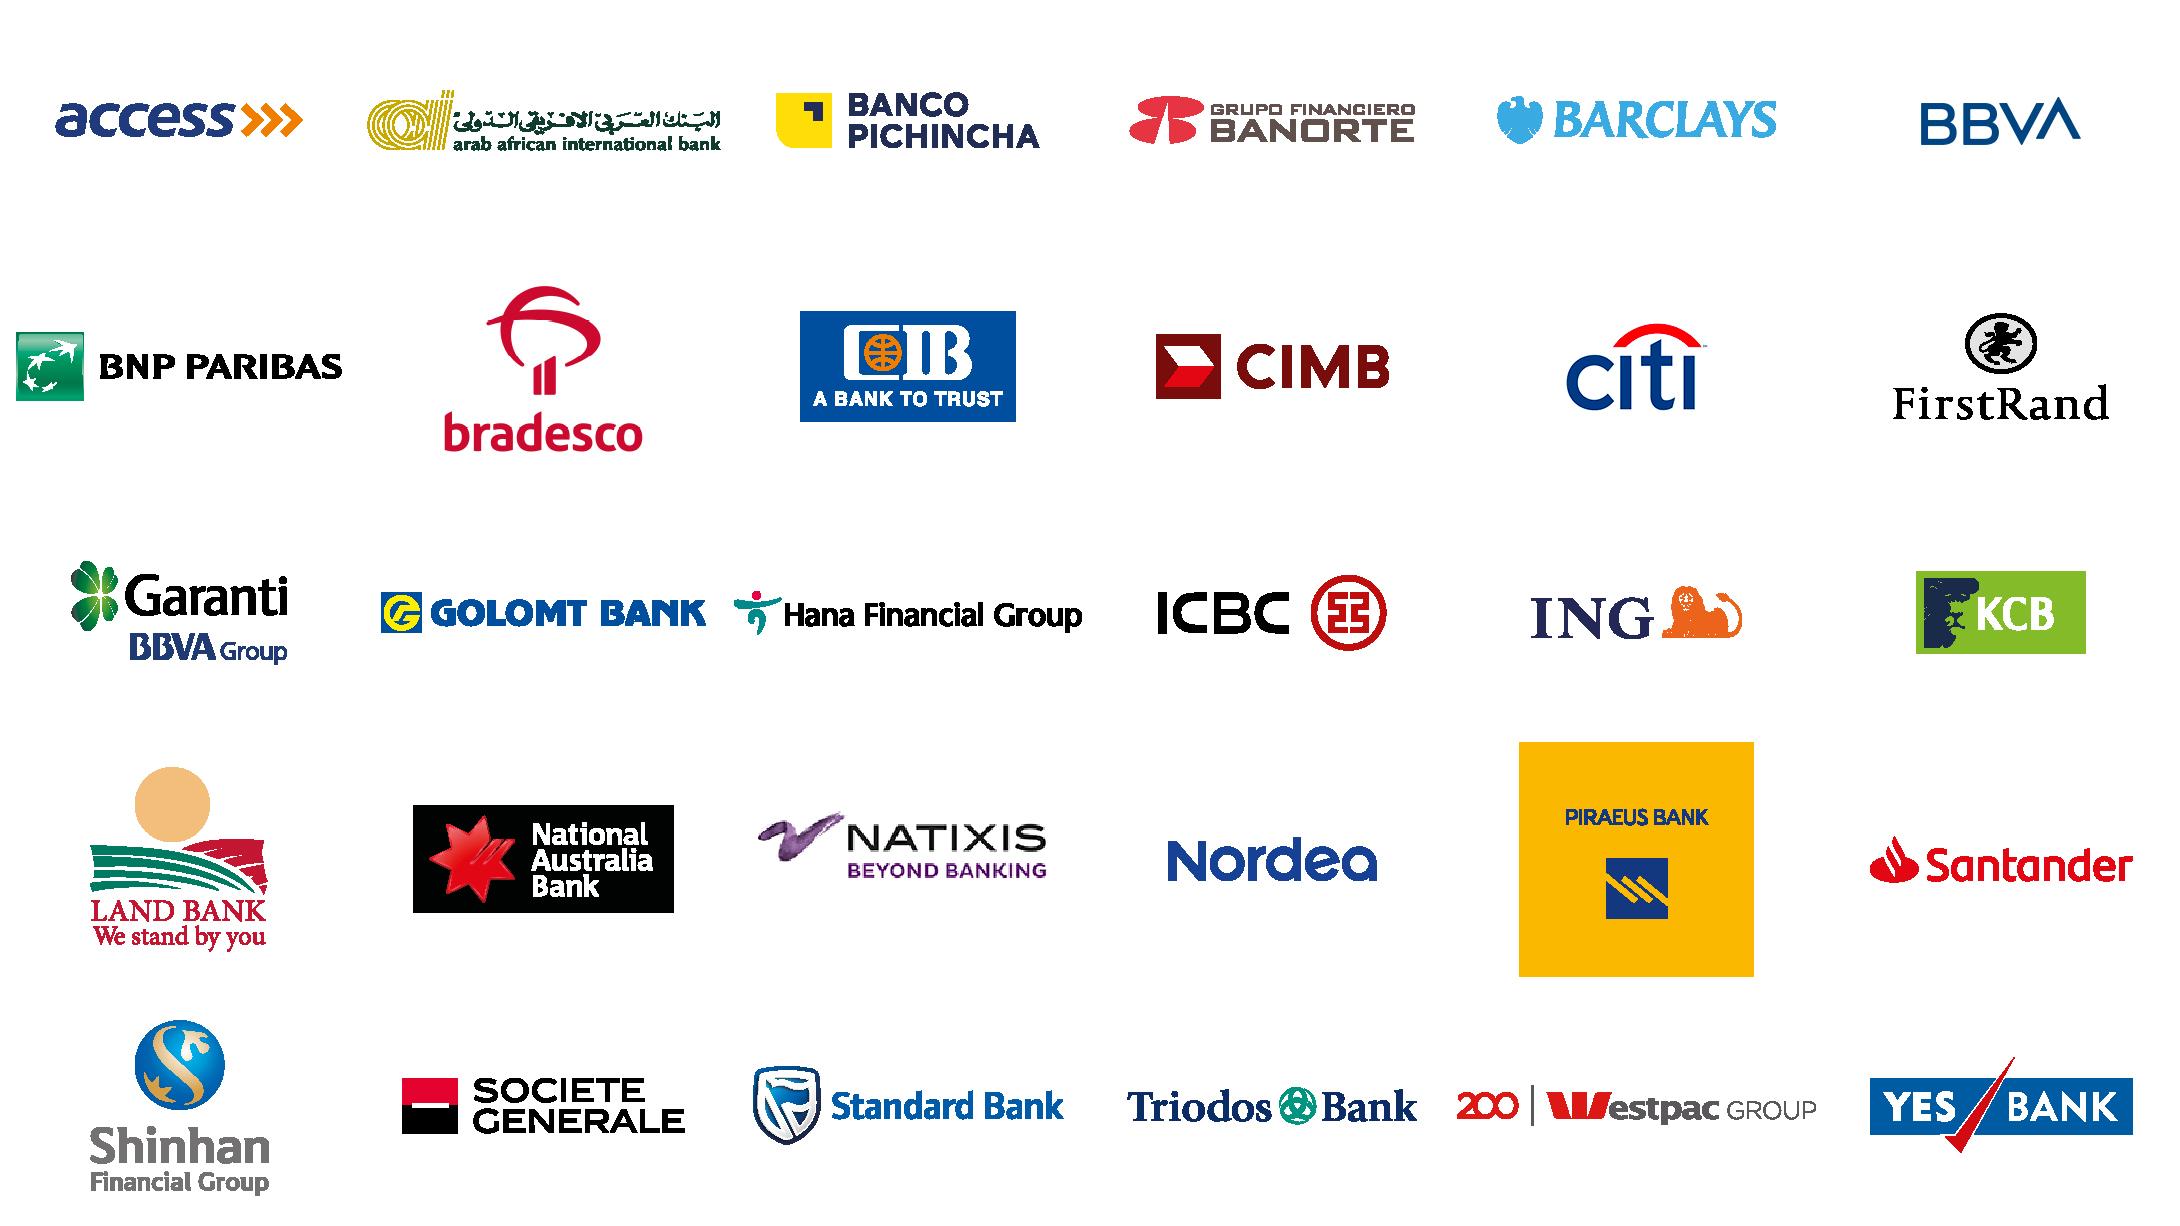 Principles for Responsible Banking